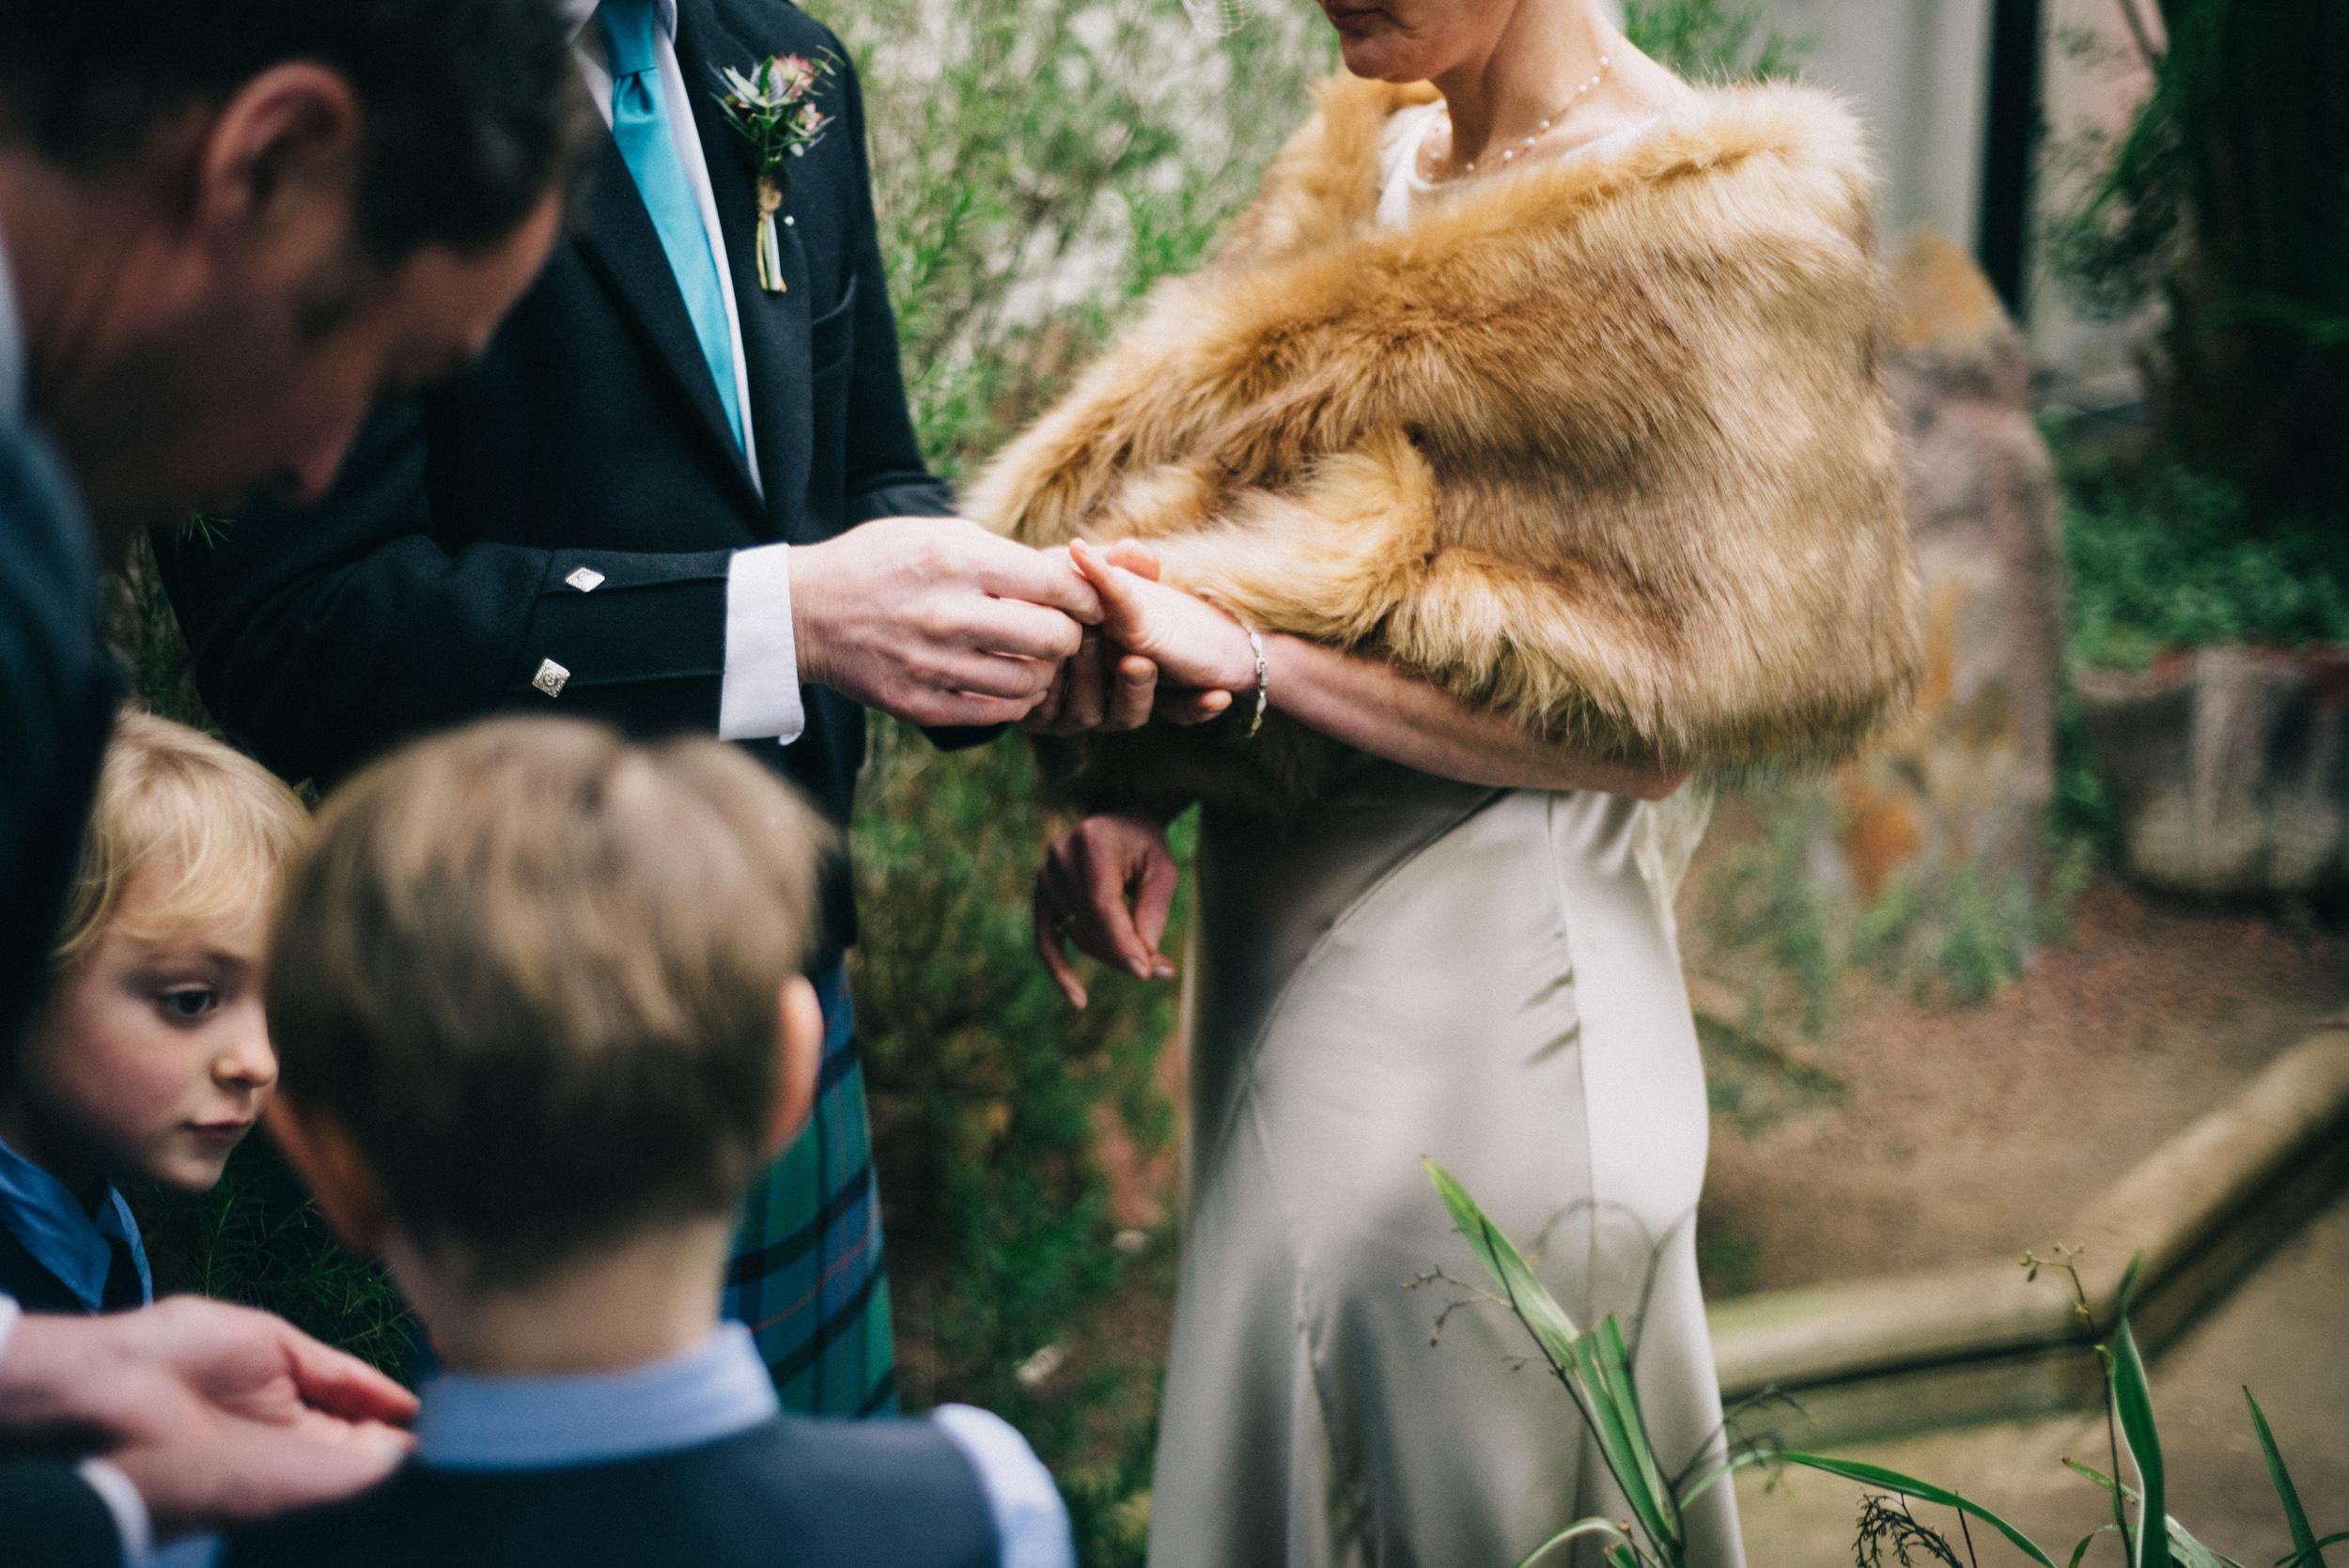 Alice-Bias-Cut-Silk-Wedding-Dress-Kate-Beaumont-Sheffield-Botanical-Gardens-by-Peakography-11.jpg